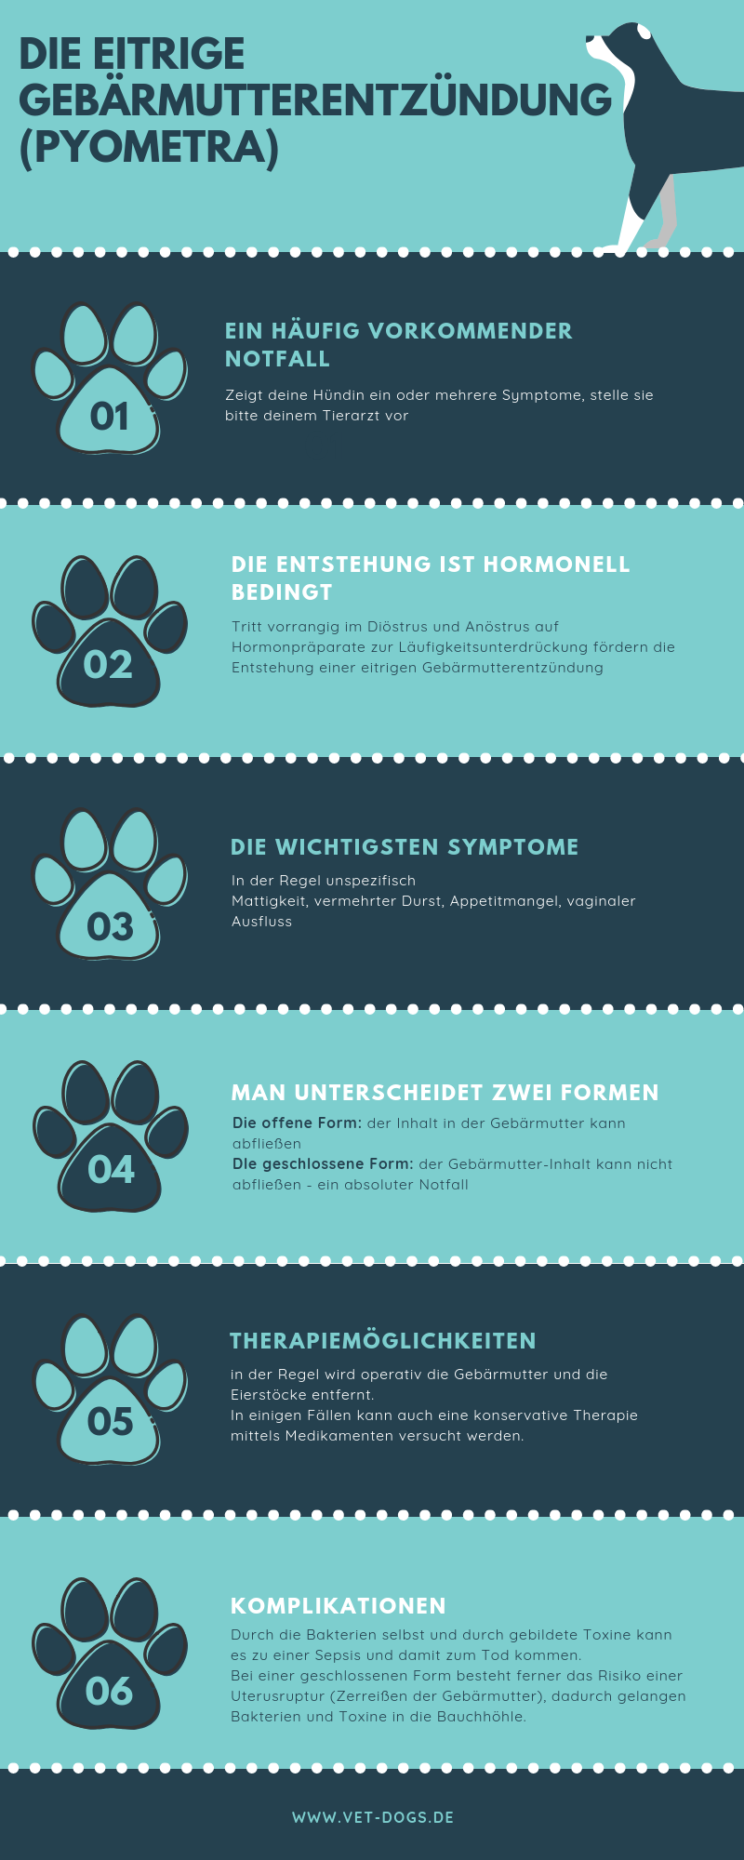 Die eitrige Gebärmutterentzündung (pyometra) der Hündin, www.vet-dogs.de